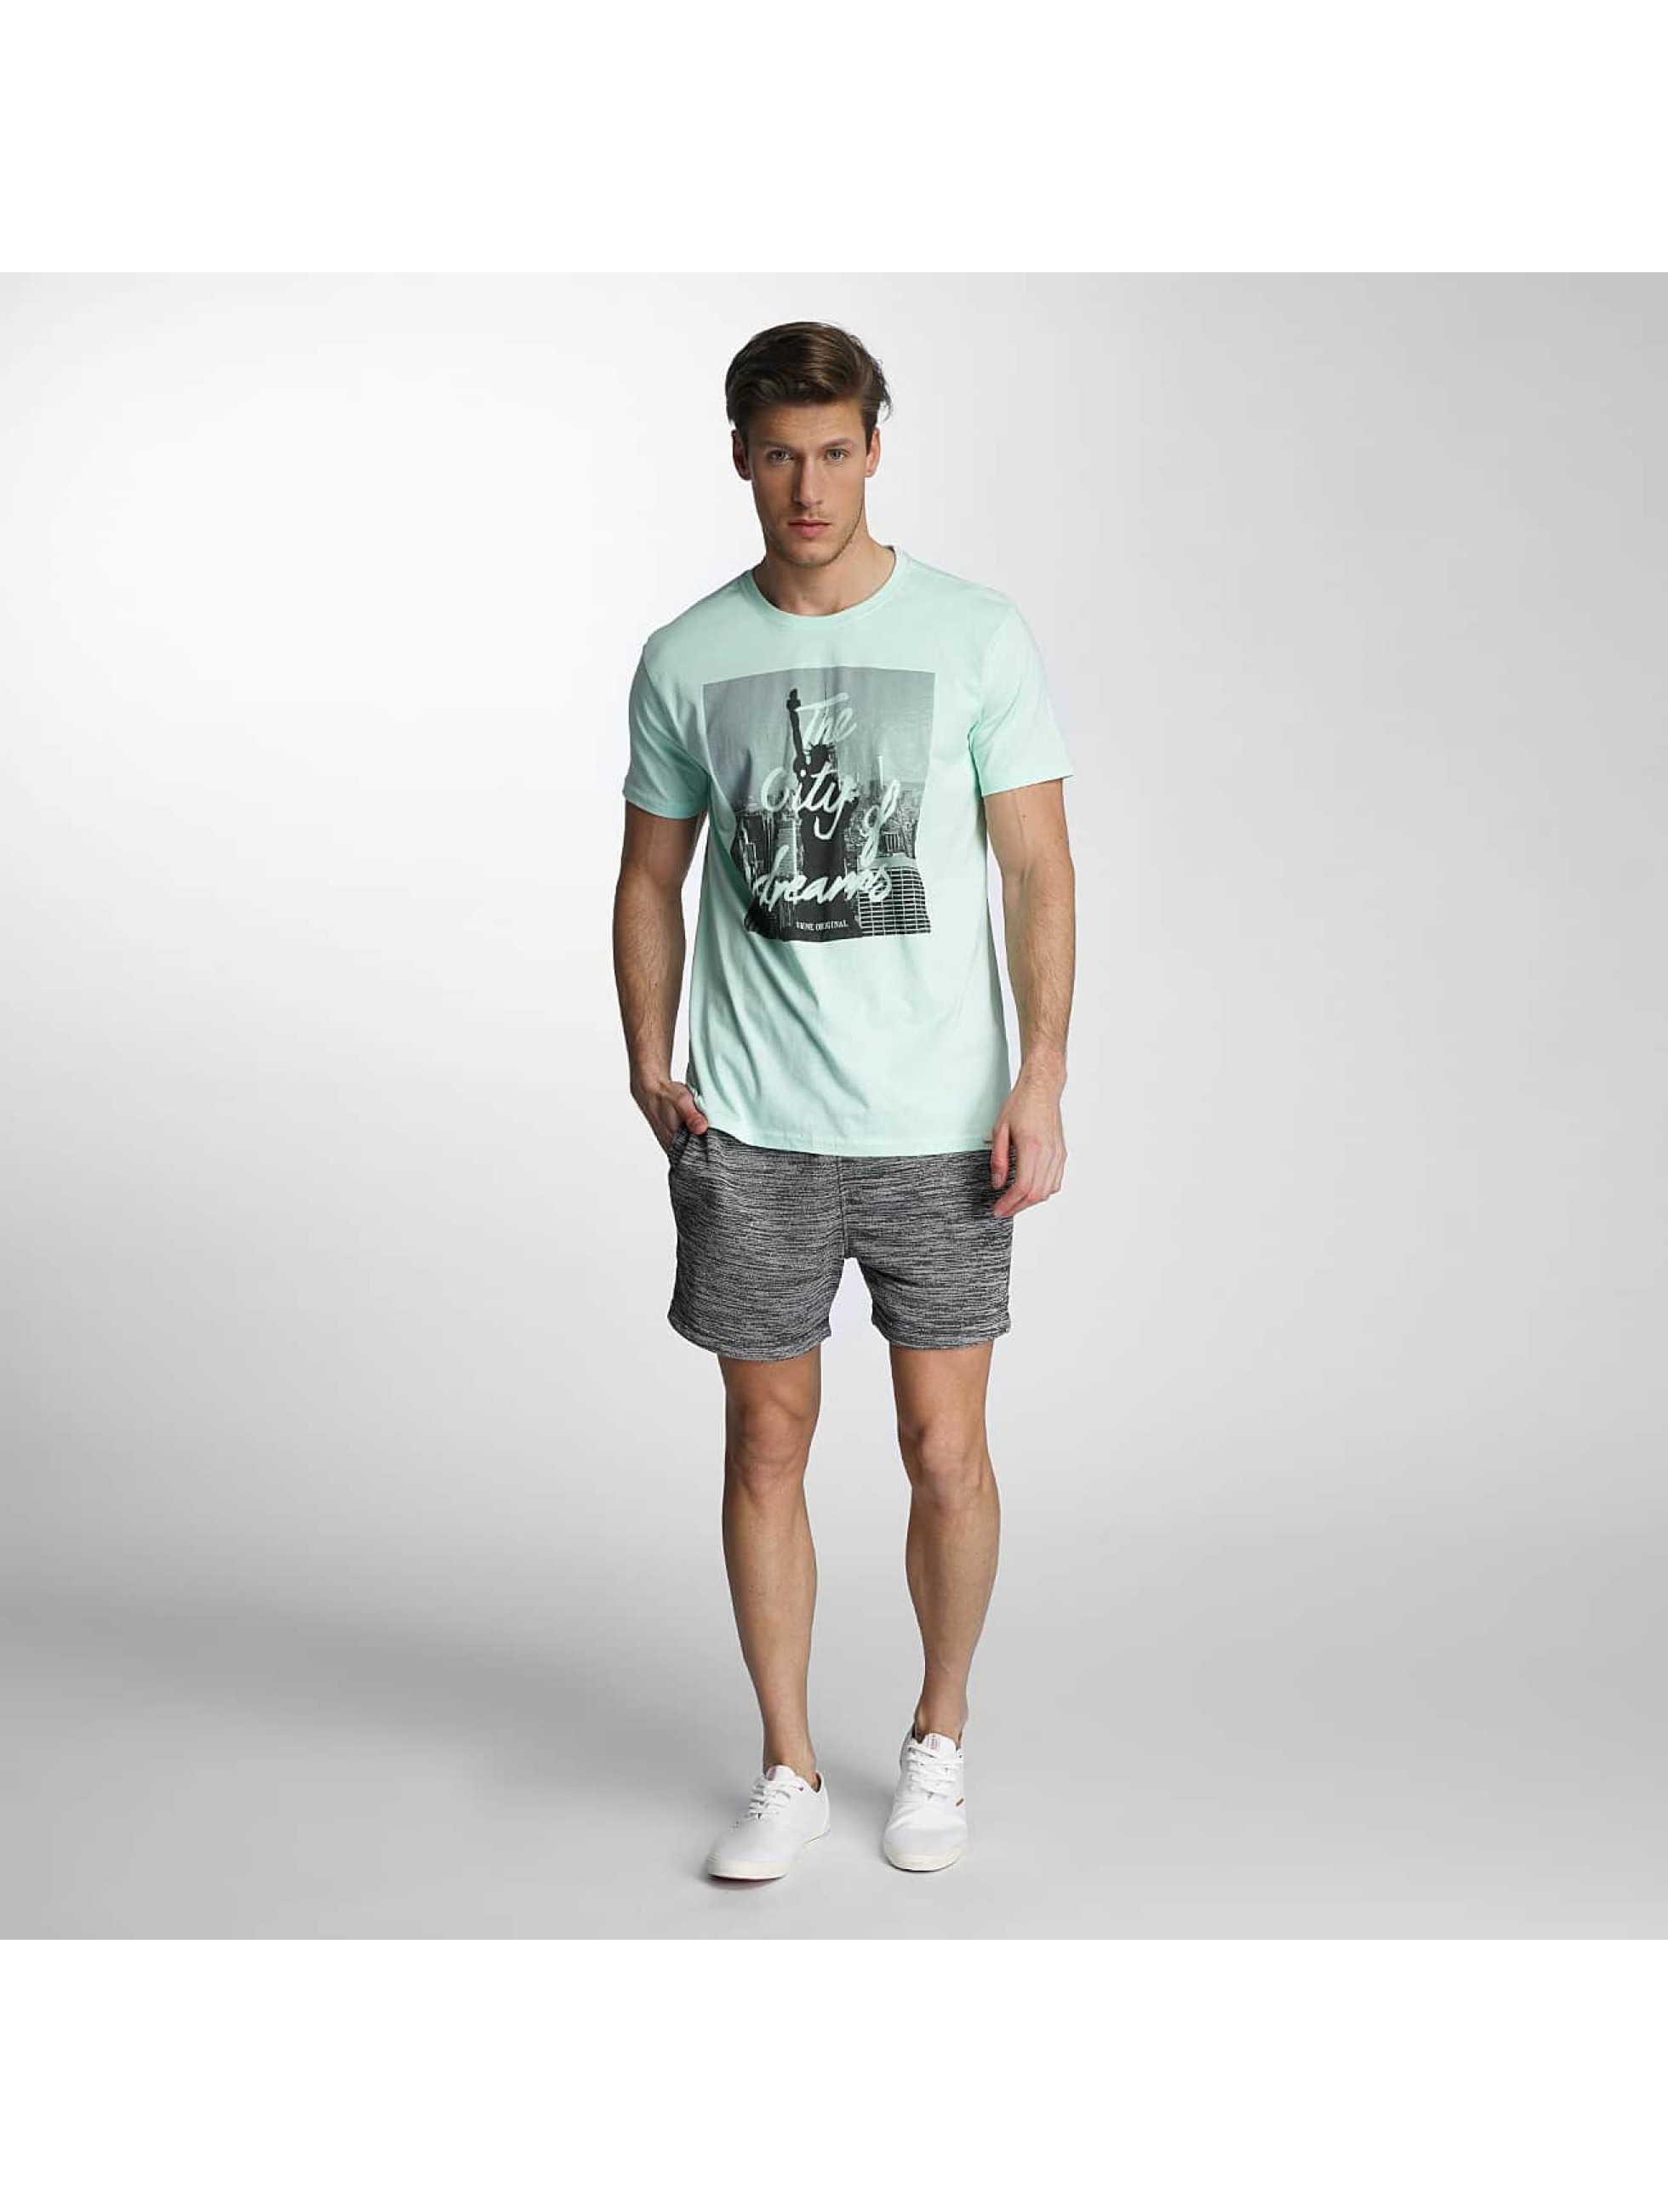 SHINE Original T-Shirt City Lane vert